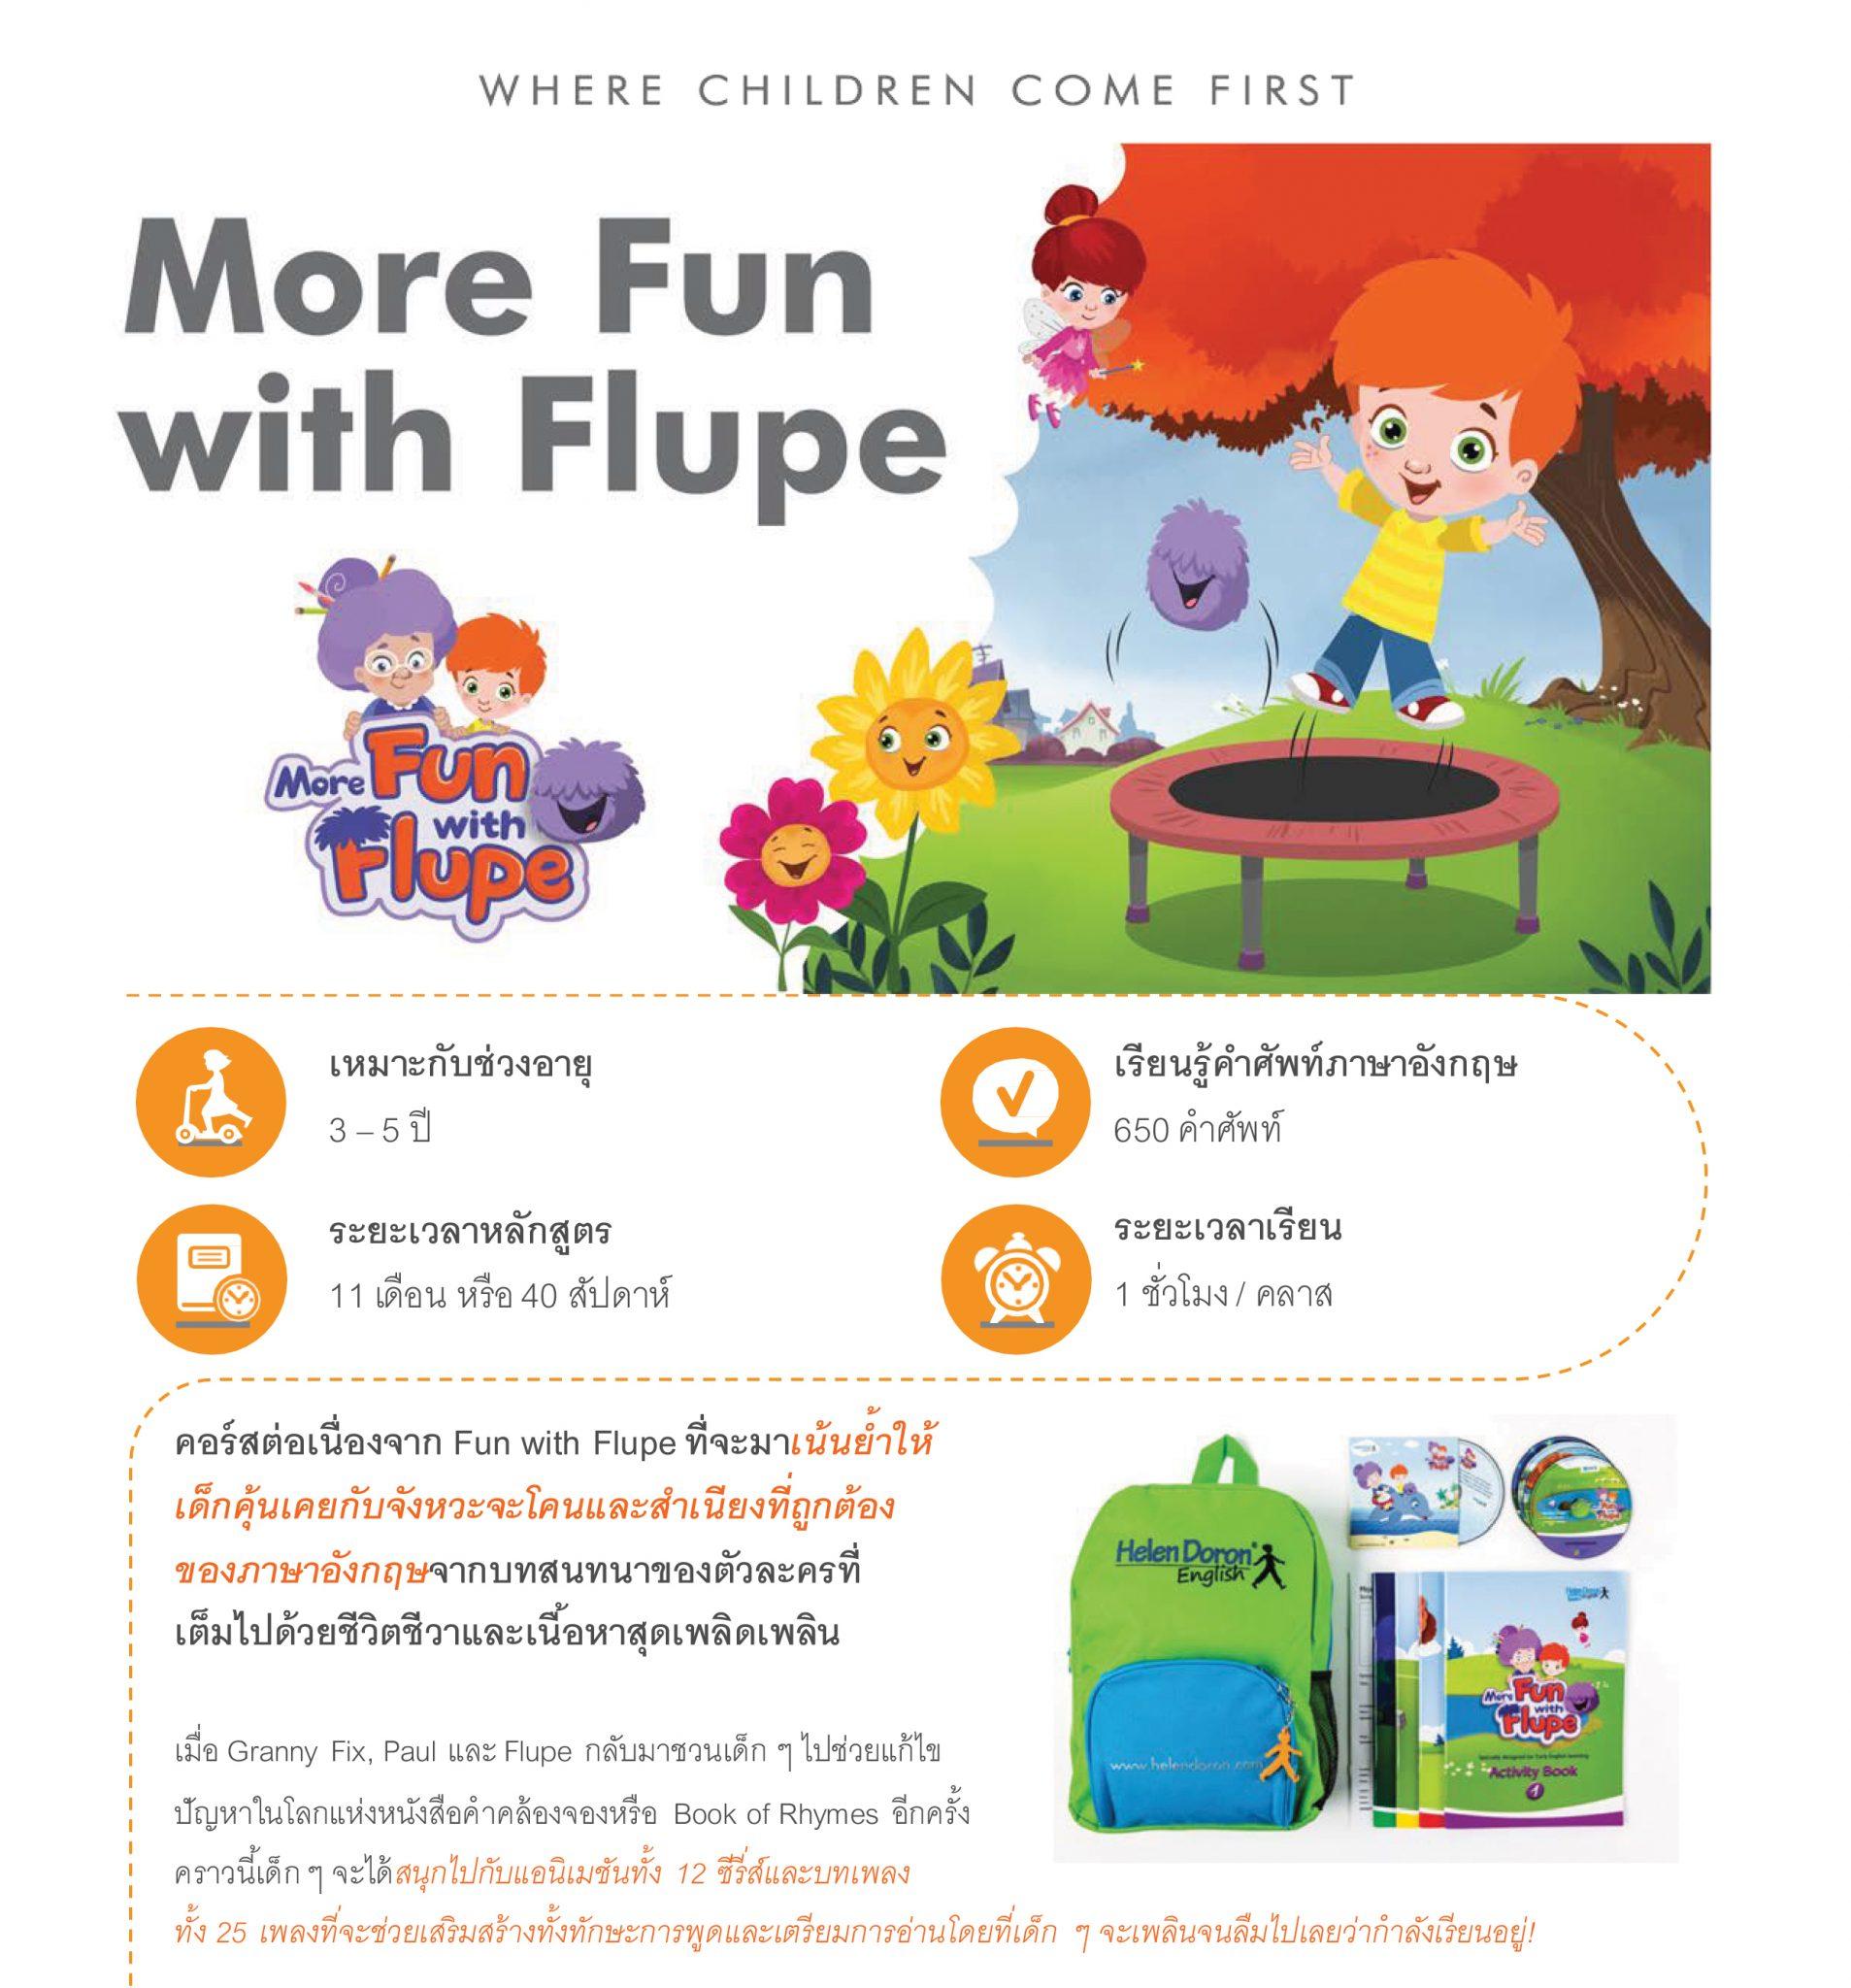 Download - More Fun with Flupe สำหรับเด็ก อายุ 3 – 6 ปี